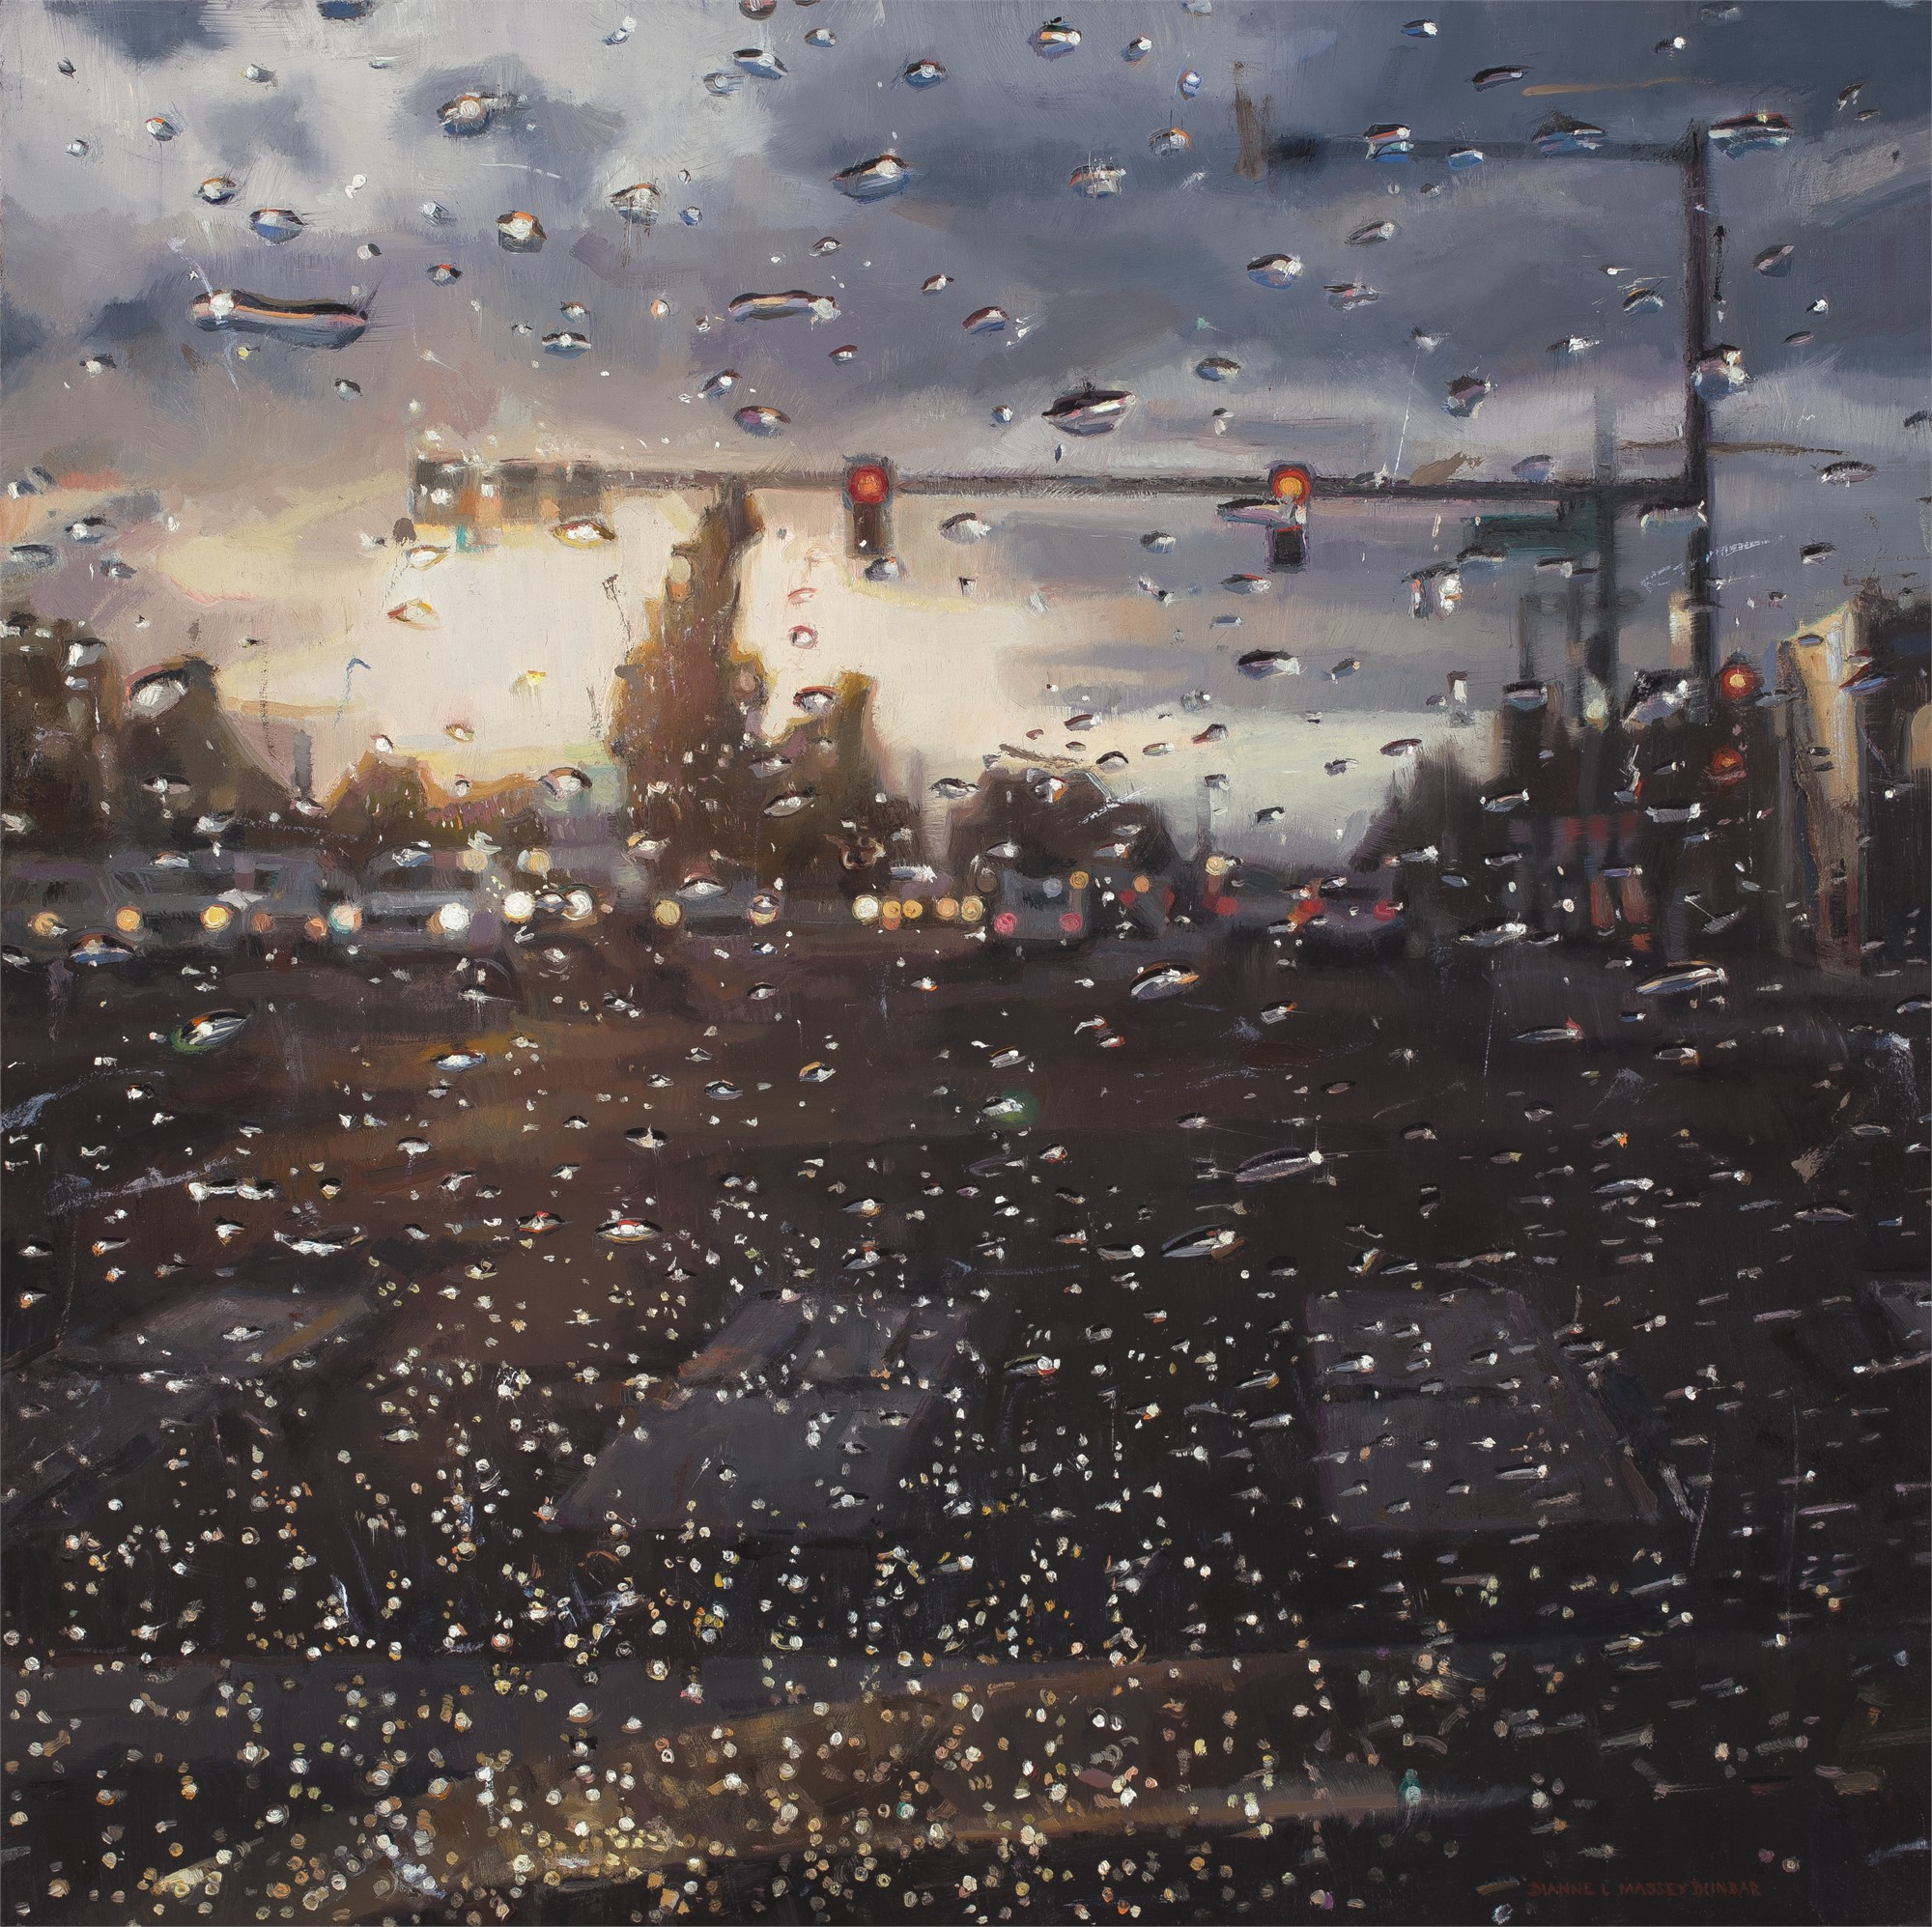 Rain on Windshield: Morning Commute by Dianne L Massey Dunbar